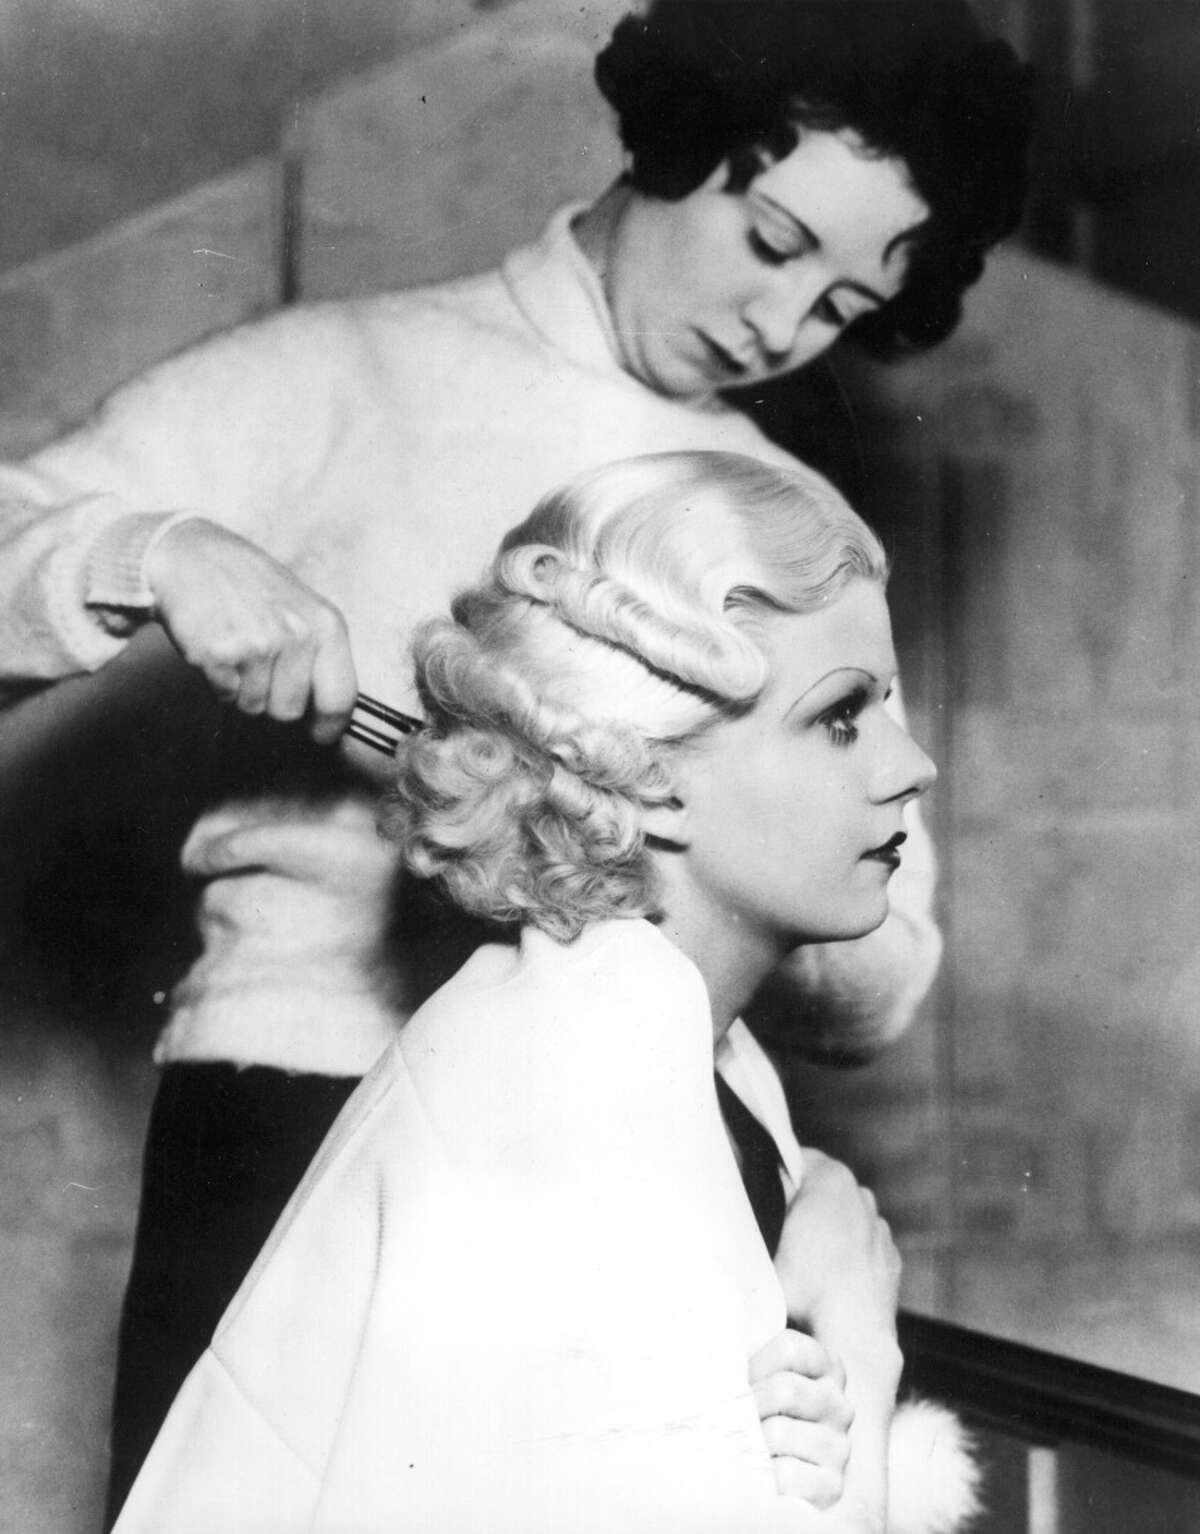 Jean Harlow (1911 - 1937), American film actress, having her famous platinum blonde hair set.